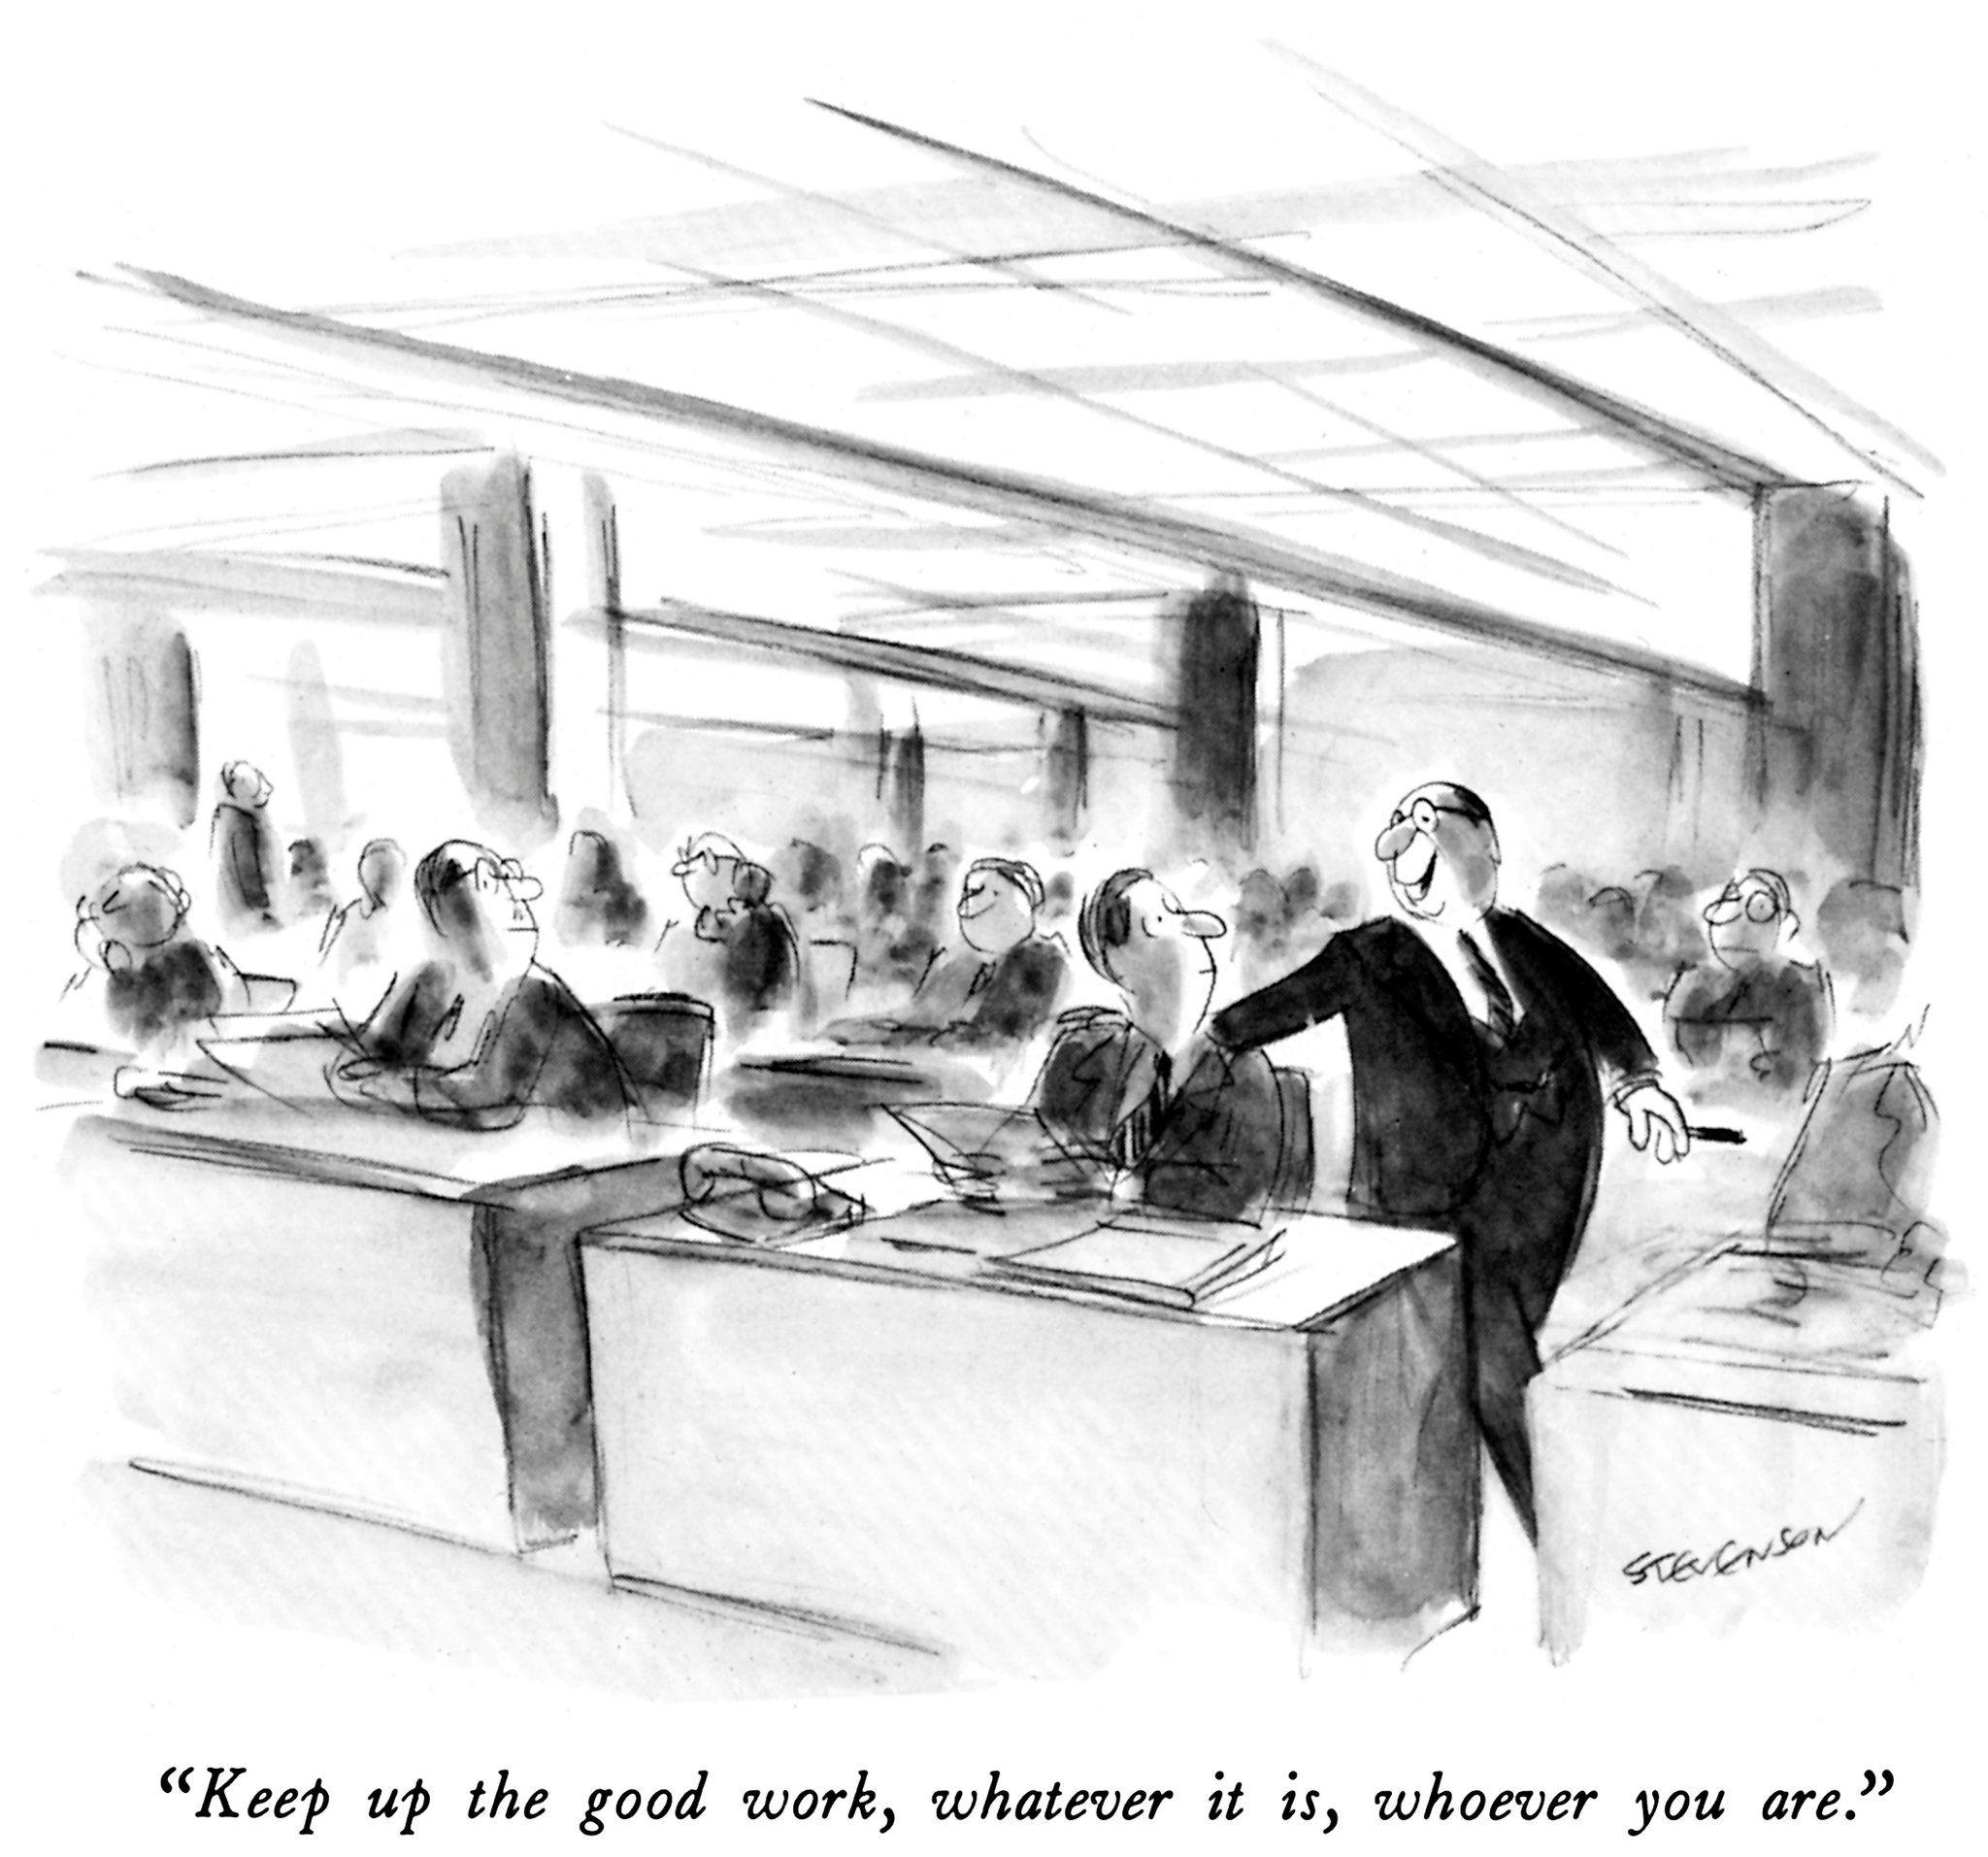 11 New Yorker Cartoons by James Stevenson | Comic | Pinterest ...